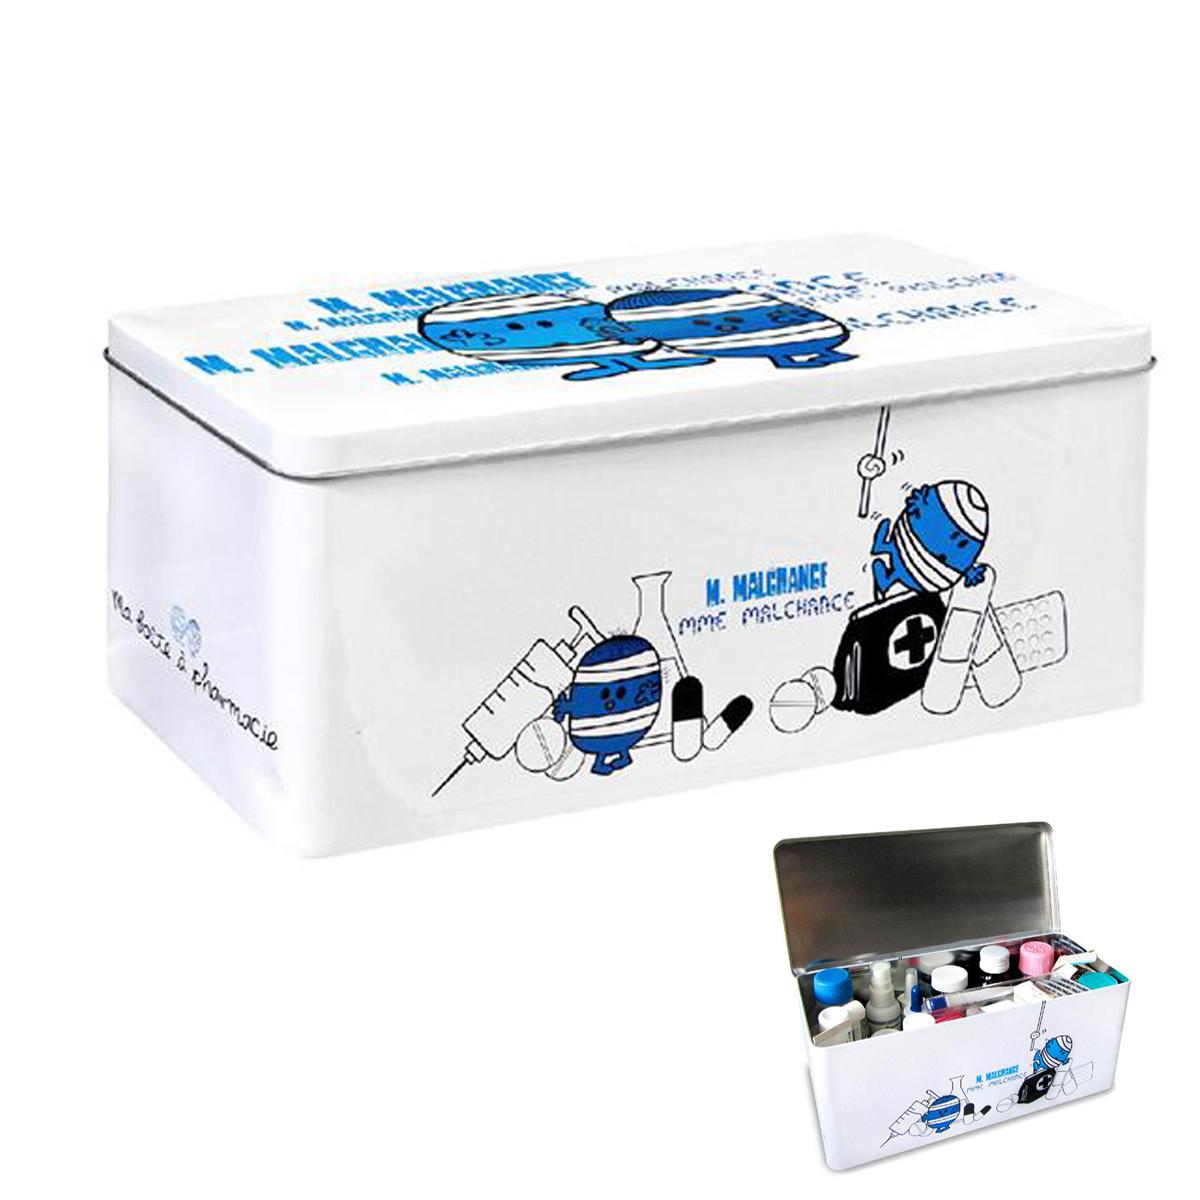 Boite à pharmacie \'Monsieur Madame\' blanc bleu (M Malchance) - 28x12x11 cm - [L8915]